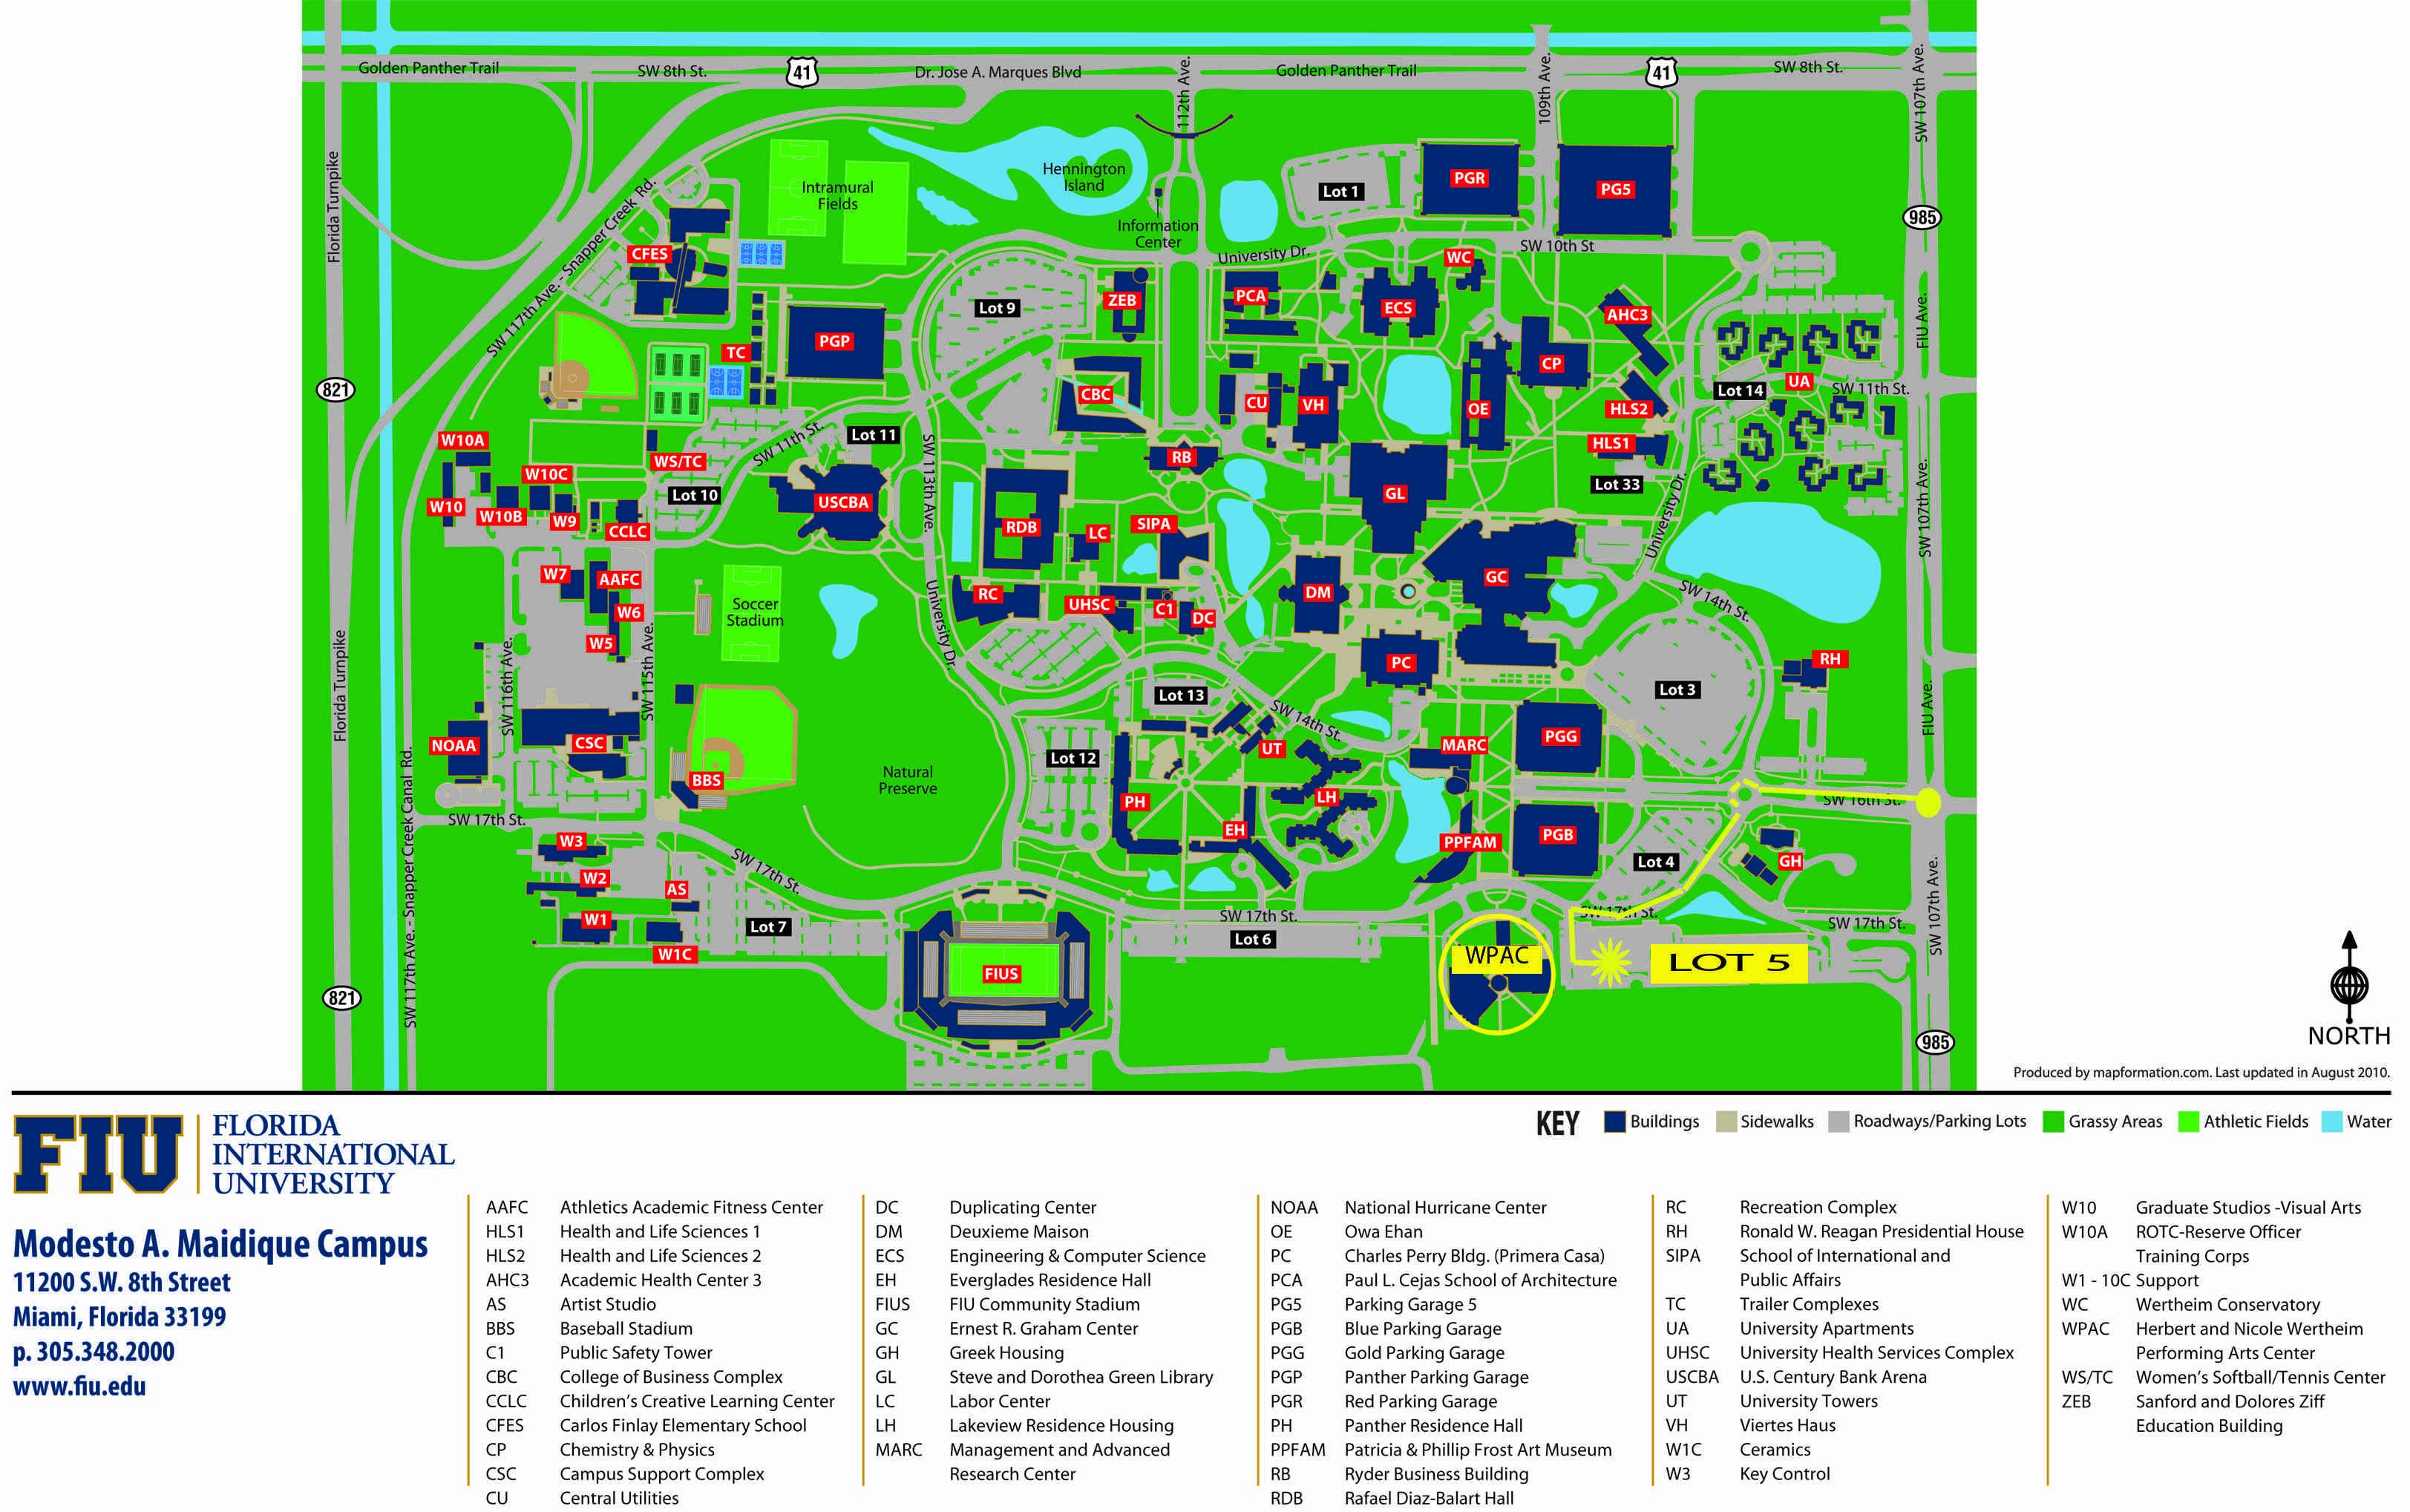 Maidique Campus 2D map